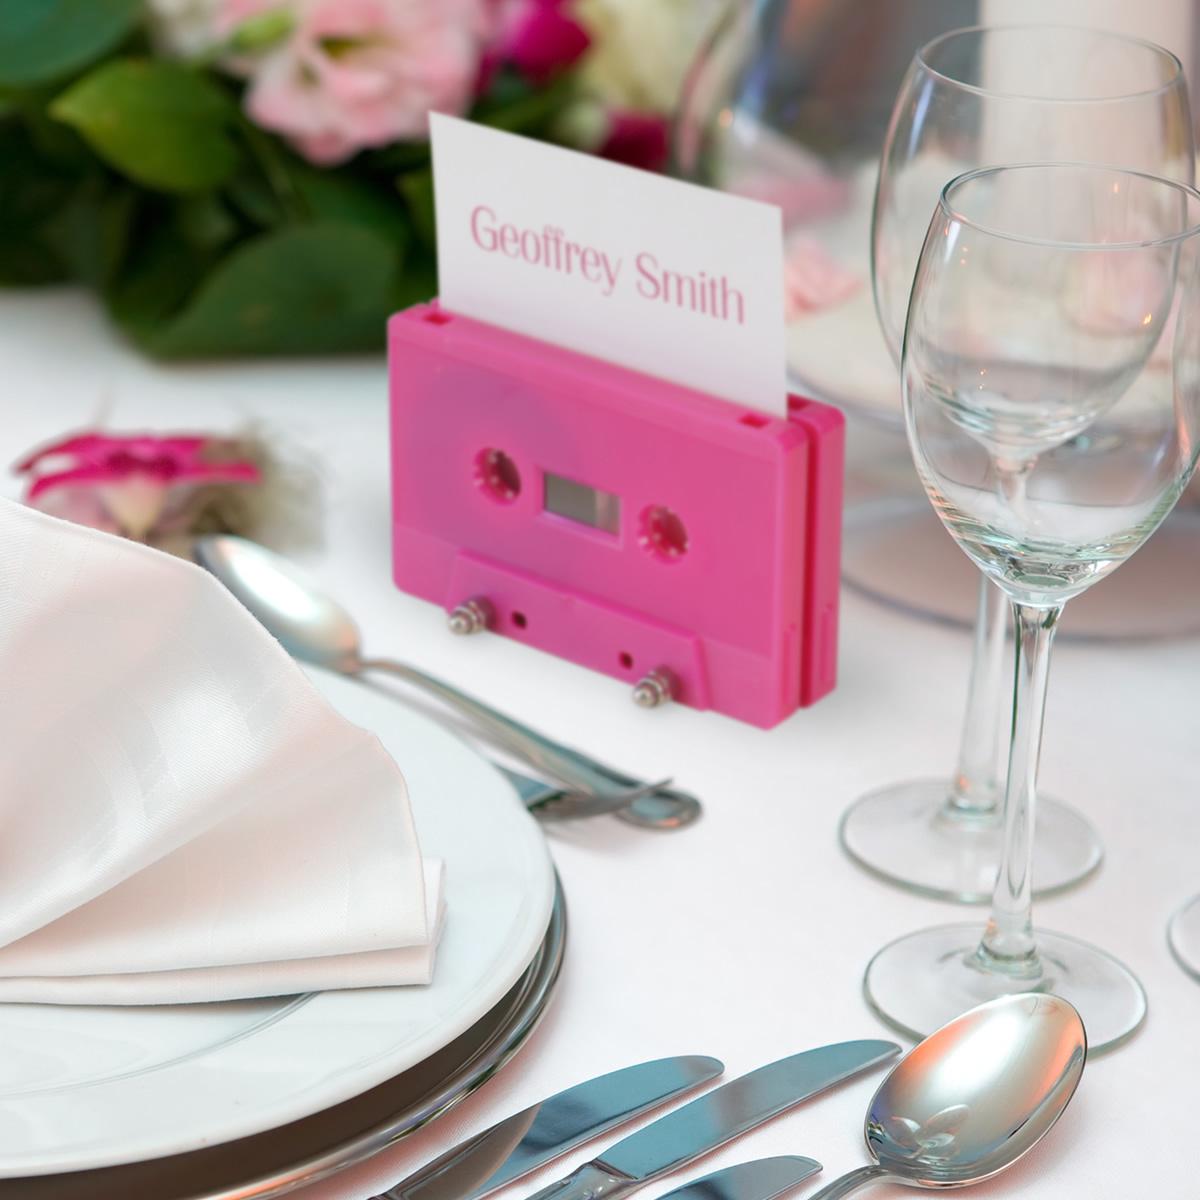 Cassette tape name place holder - Retro Style Media